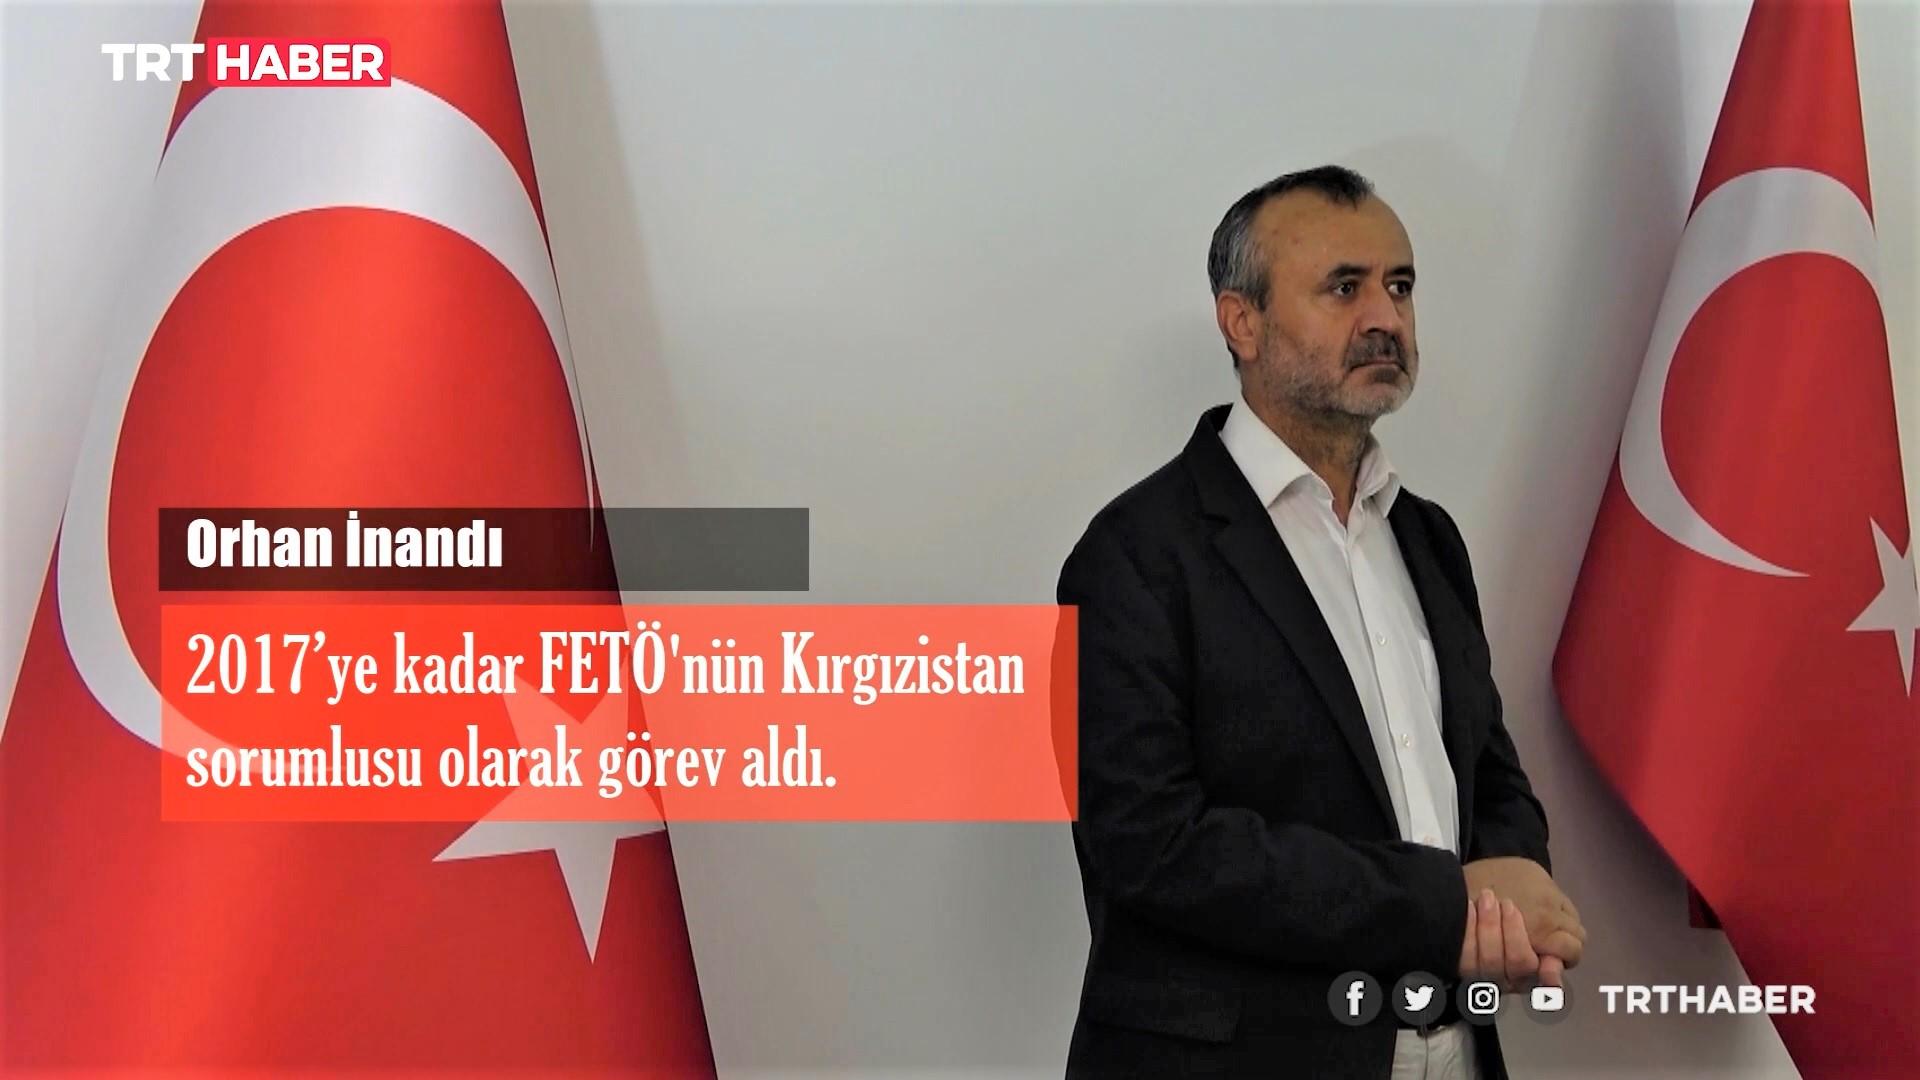 Турецкая разведка схватила Орхана Инанди - эмиссара Гюлена